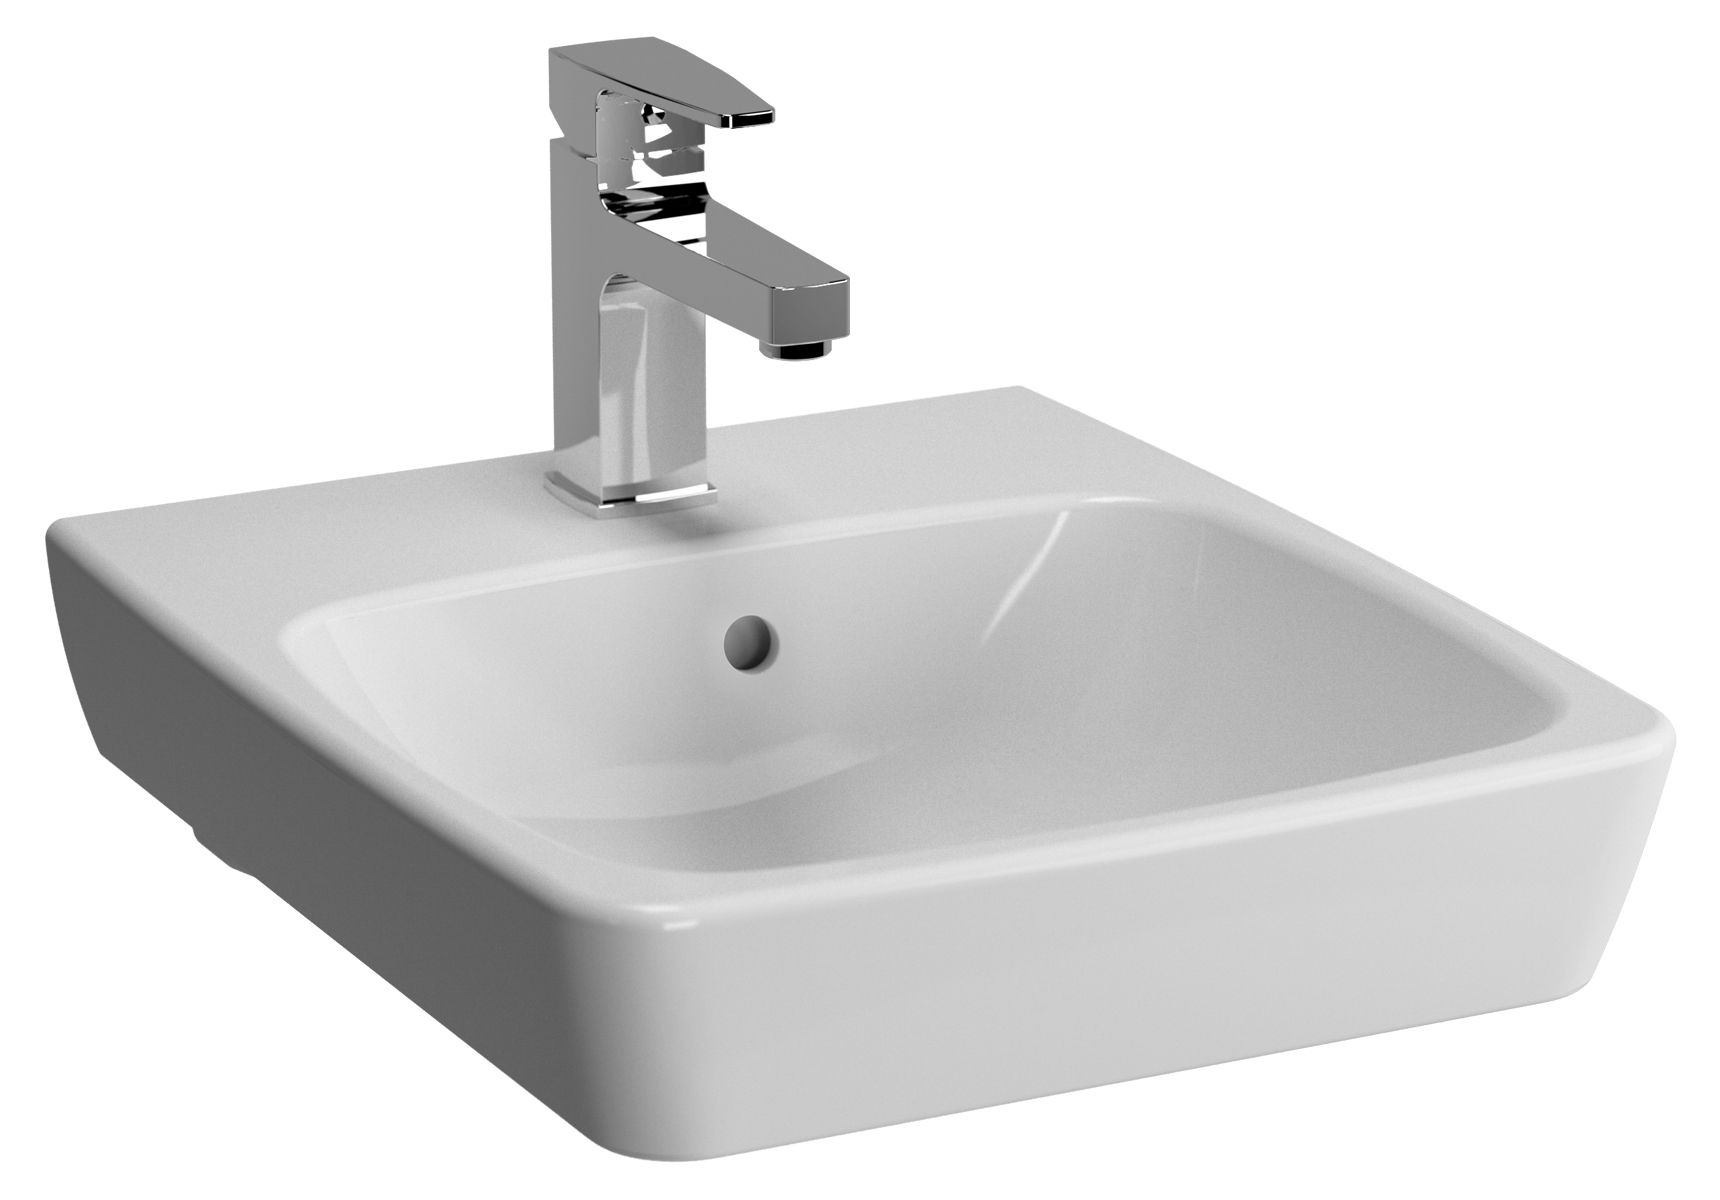 Metropole Handwaschbecken, 40 cm